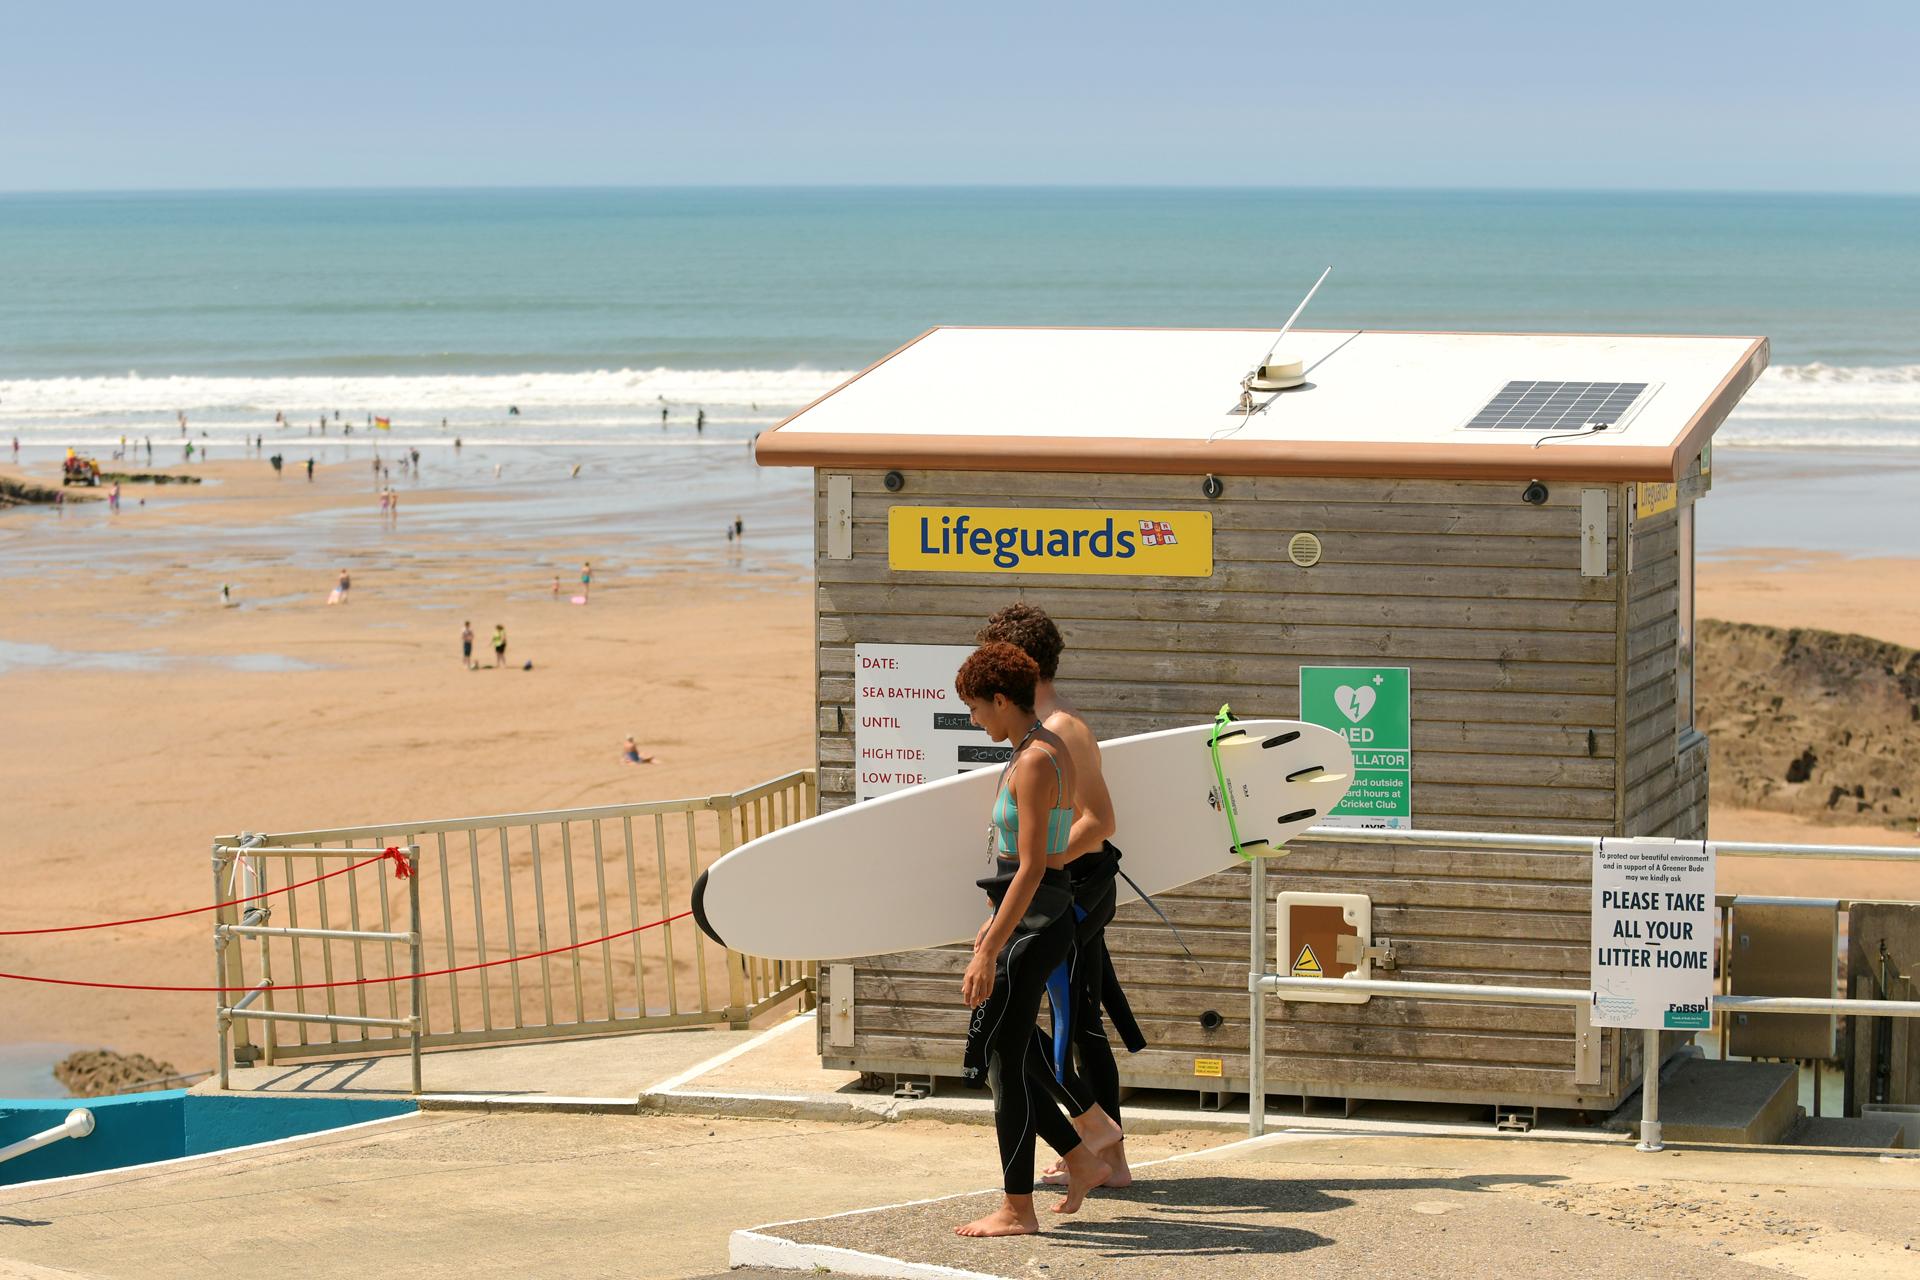 Lifeguards on duty at Summerleaze beach